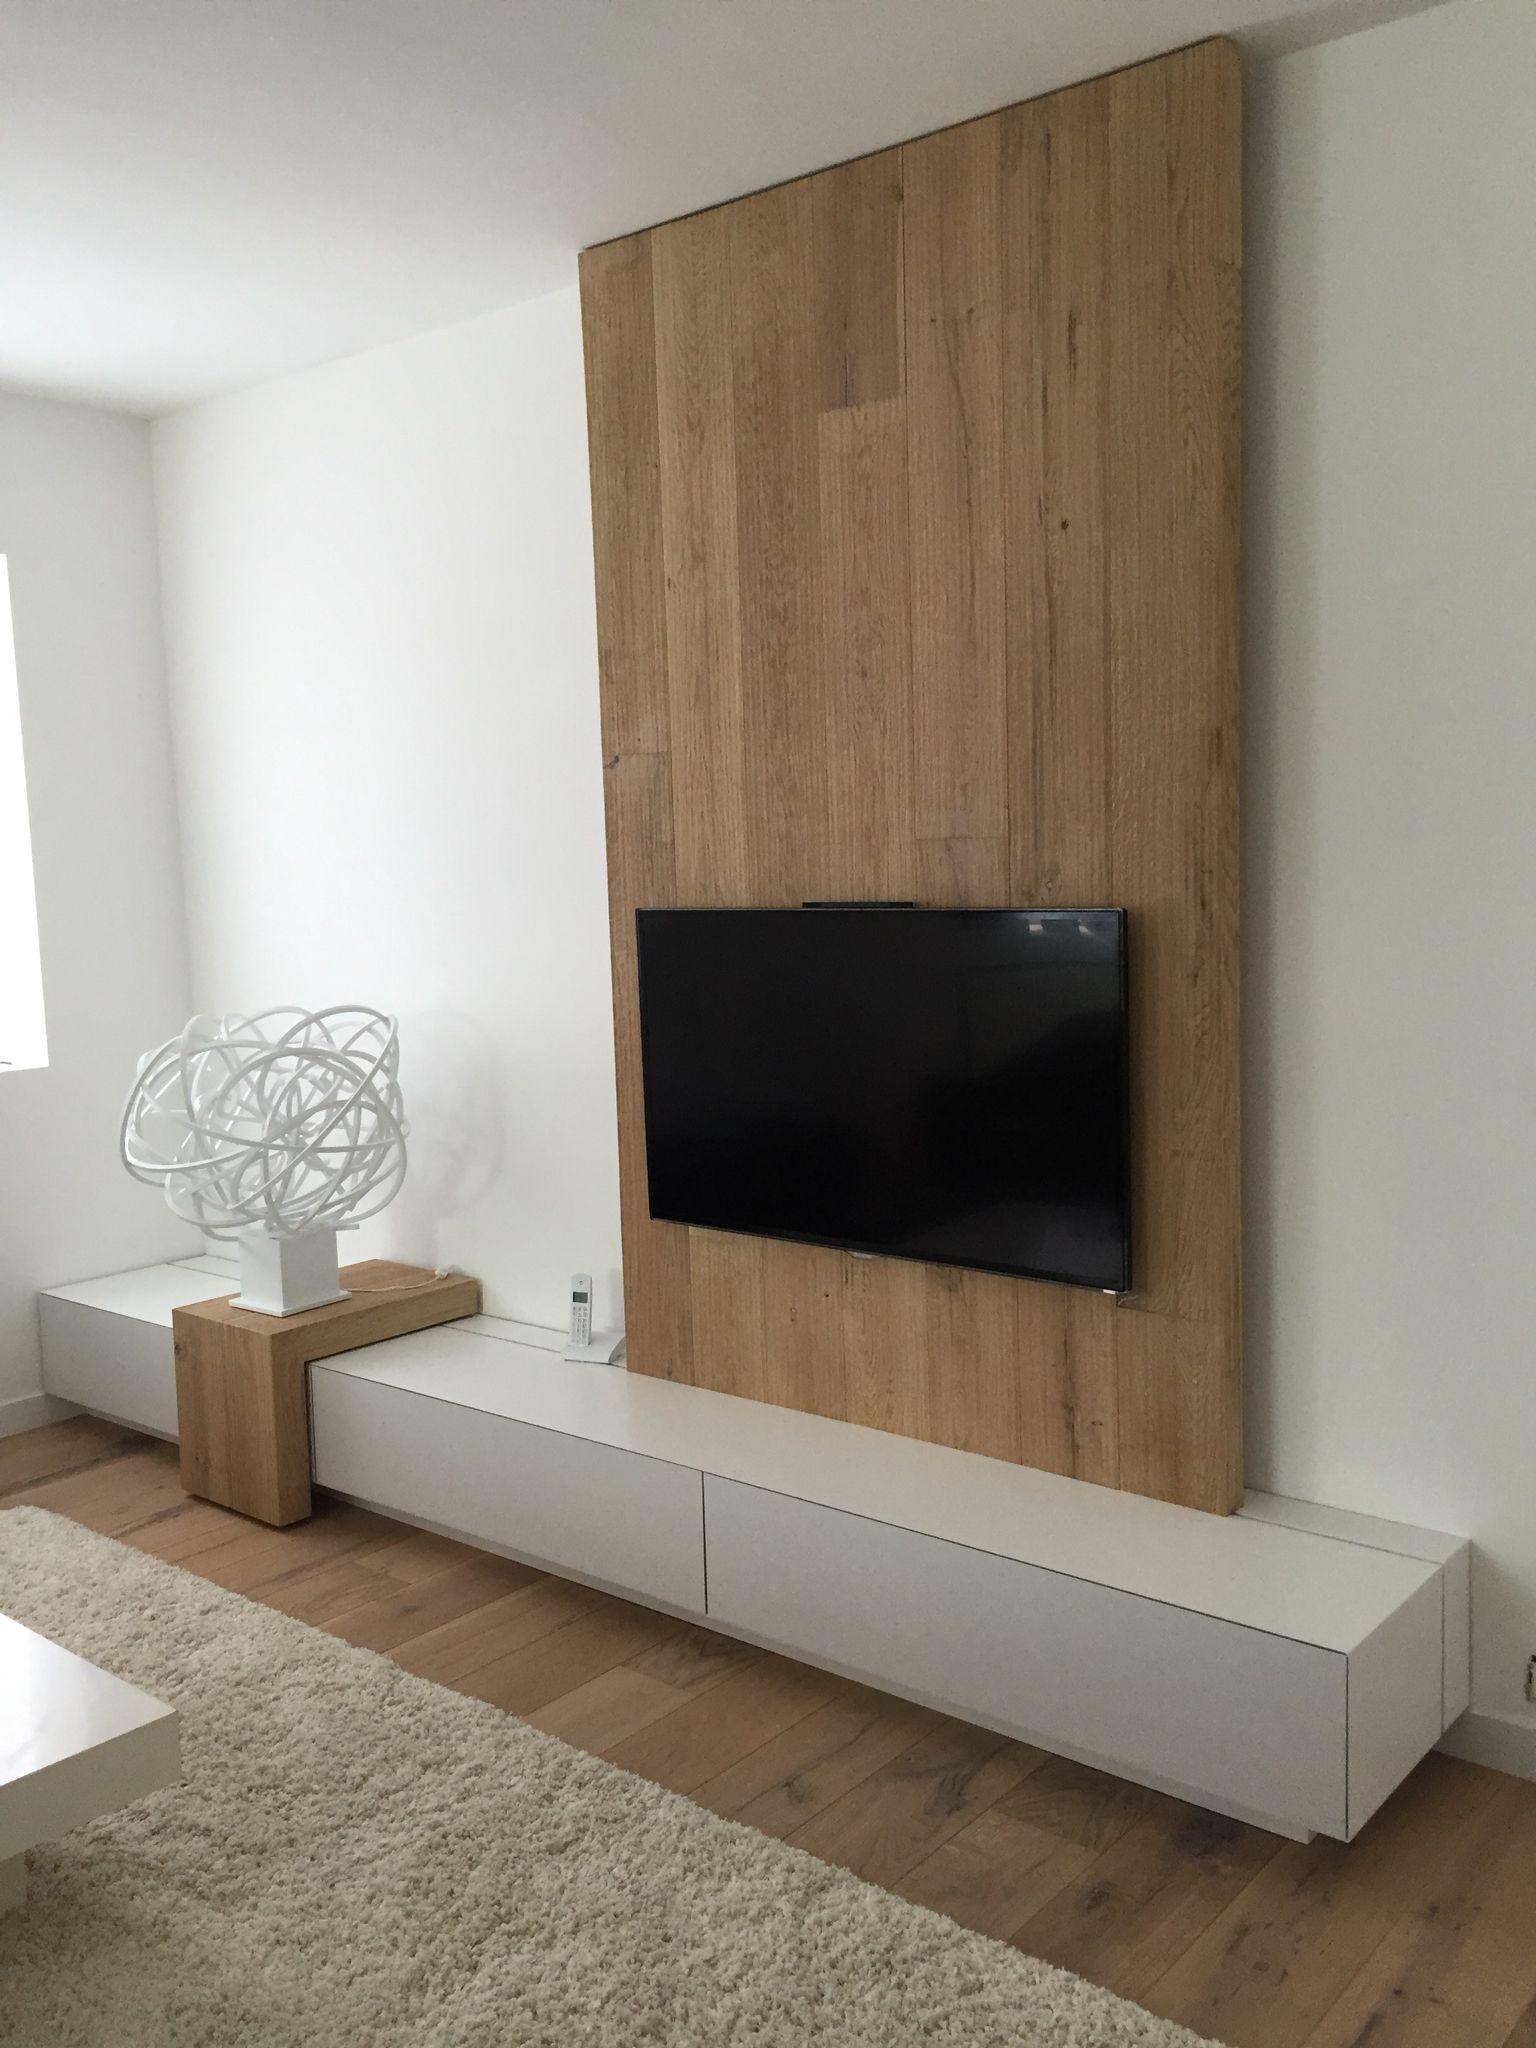 Interior design-ideen wohnzimmer mit tv meuble tv laqué blanc et chêne brossé woodlineconcept